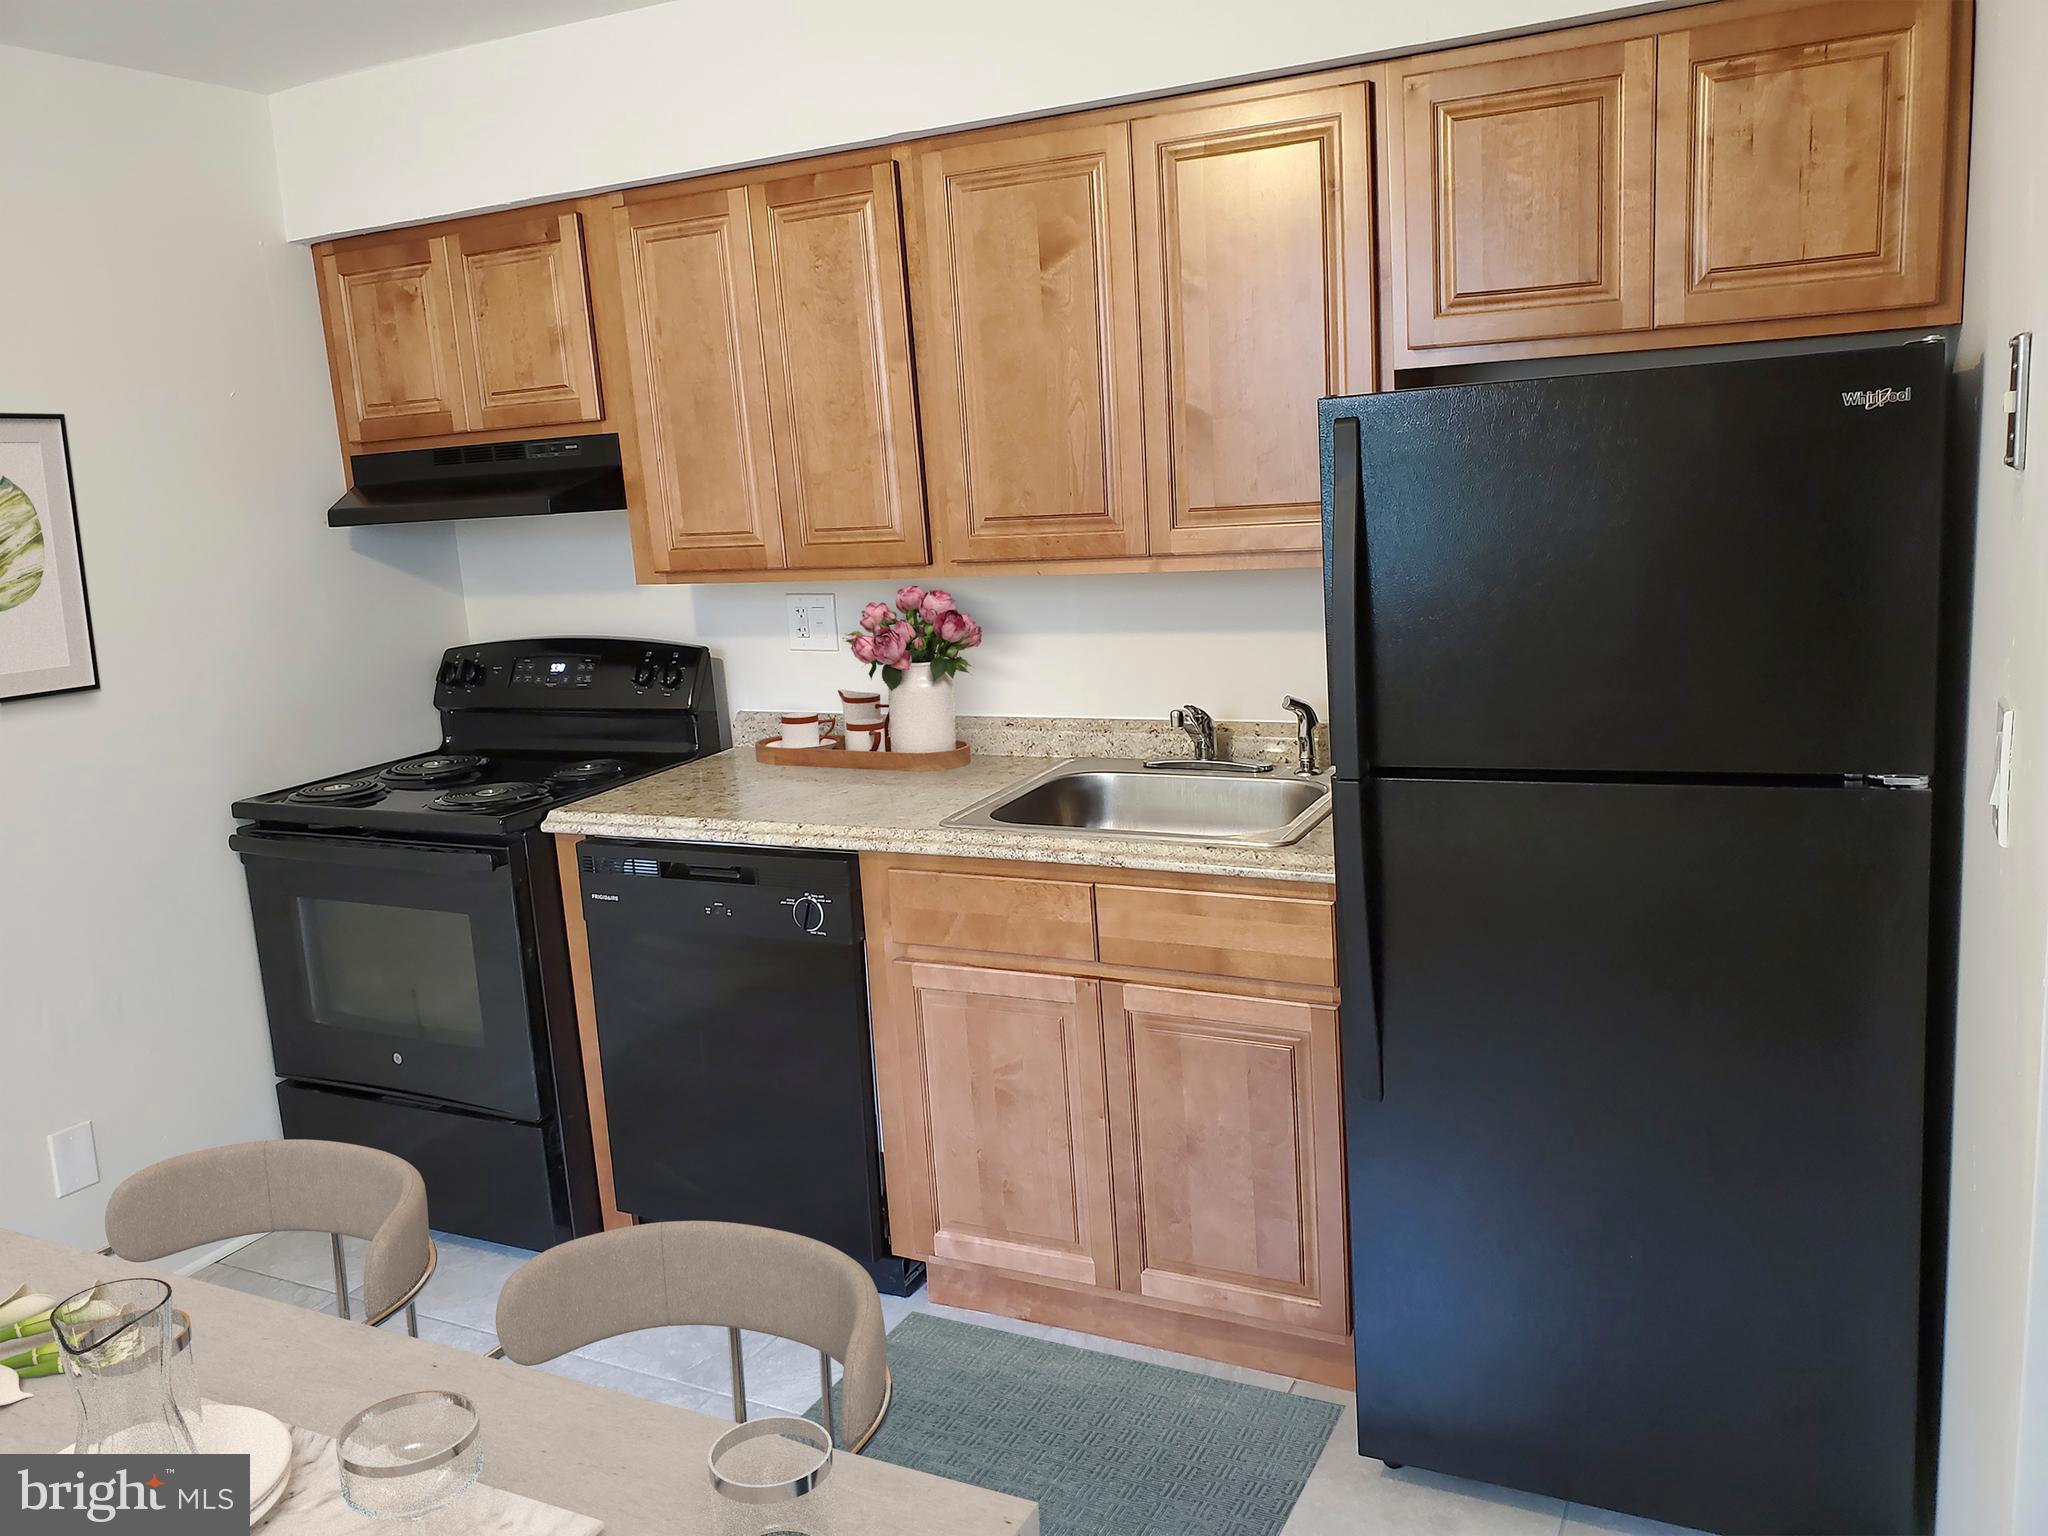 434-2 W VINE STREET, HATFIELD, Pennsylvania 19440, 2 Bedrooms Bedrooms, ,1 BathroomBathrooms,Rental,For Rent,434-2 W VINE STREET,PAMC659074